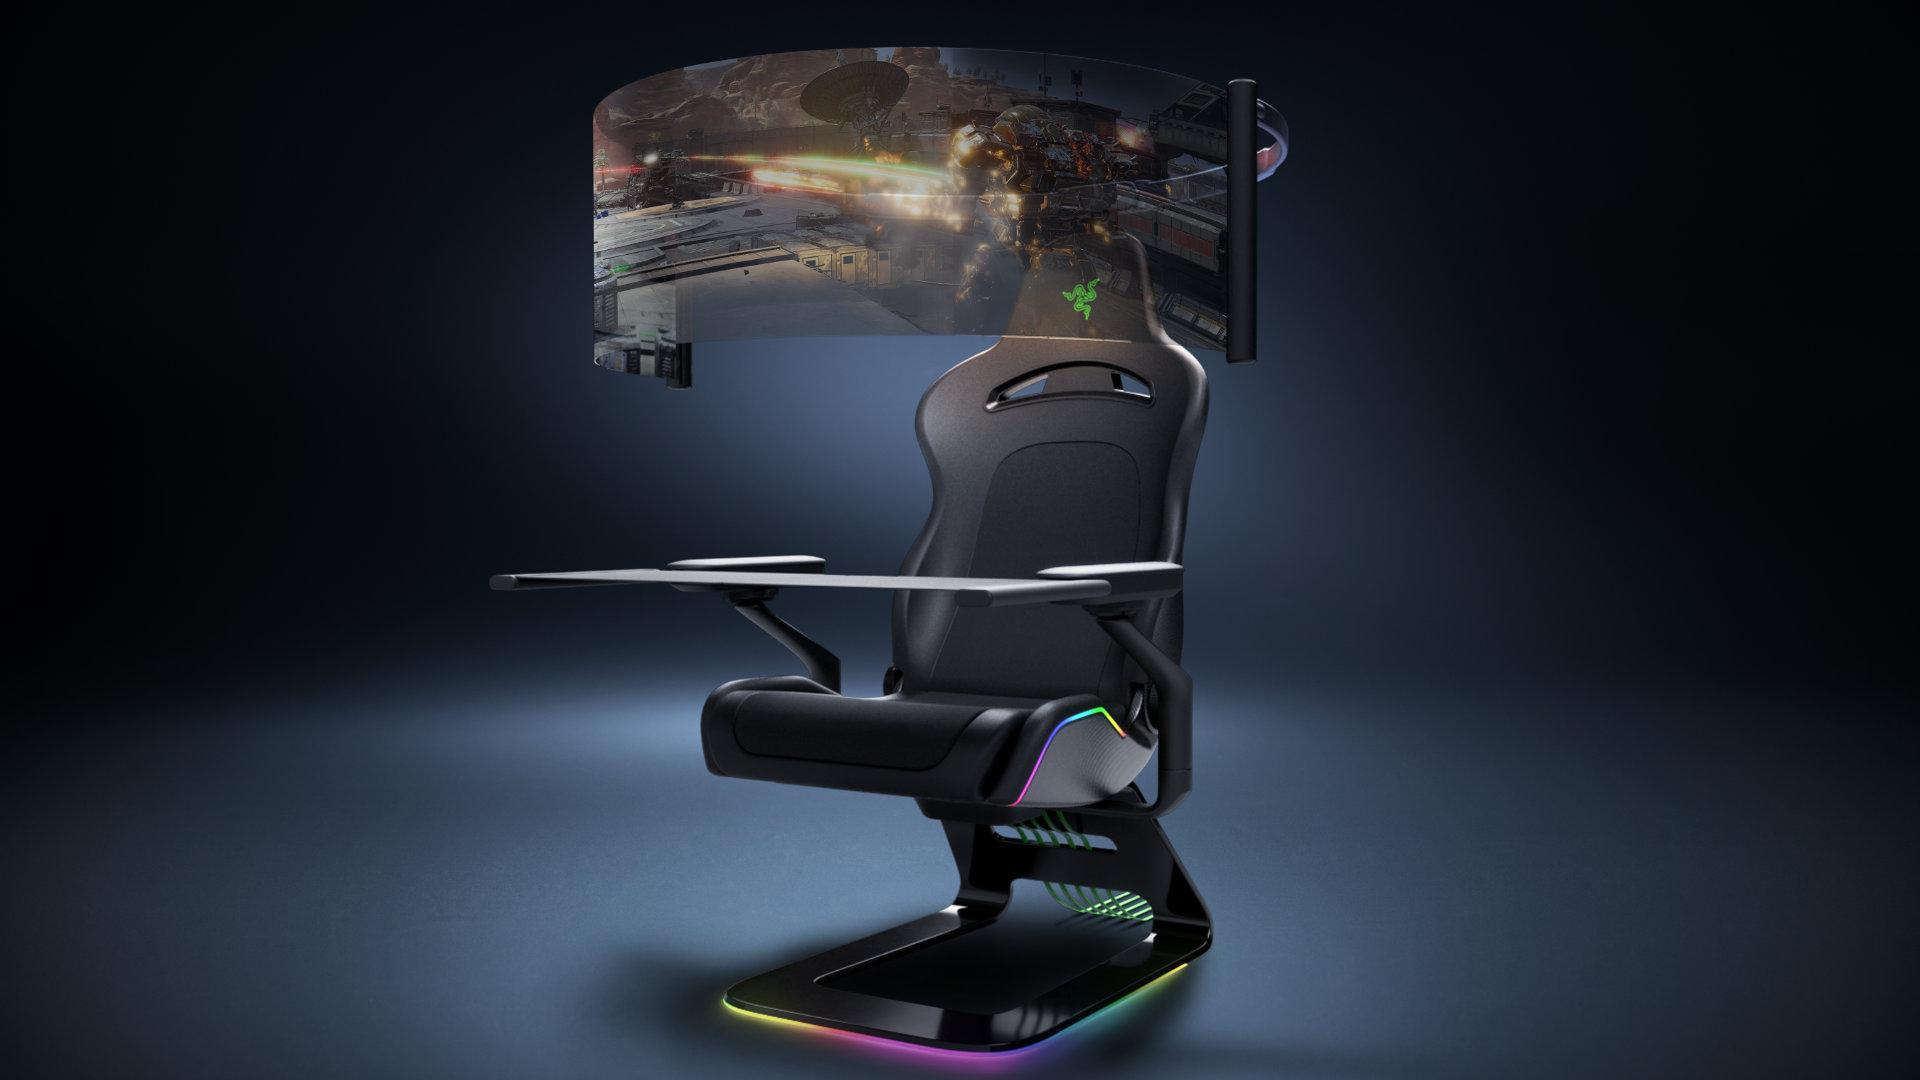 Razer's concept gaming cockpit is surprisingly sensible